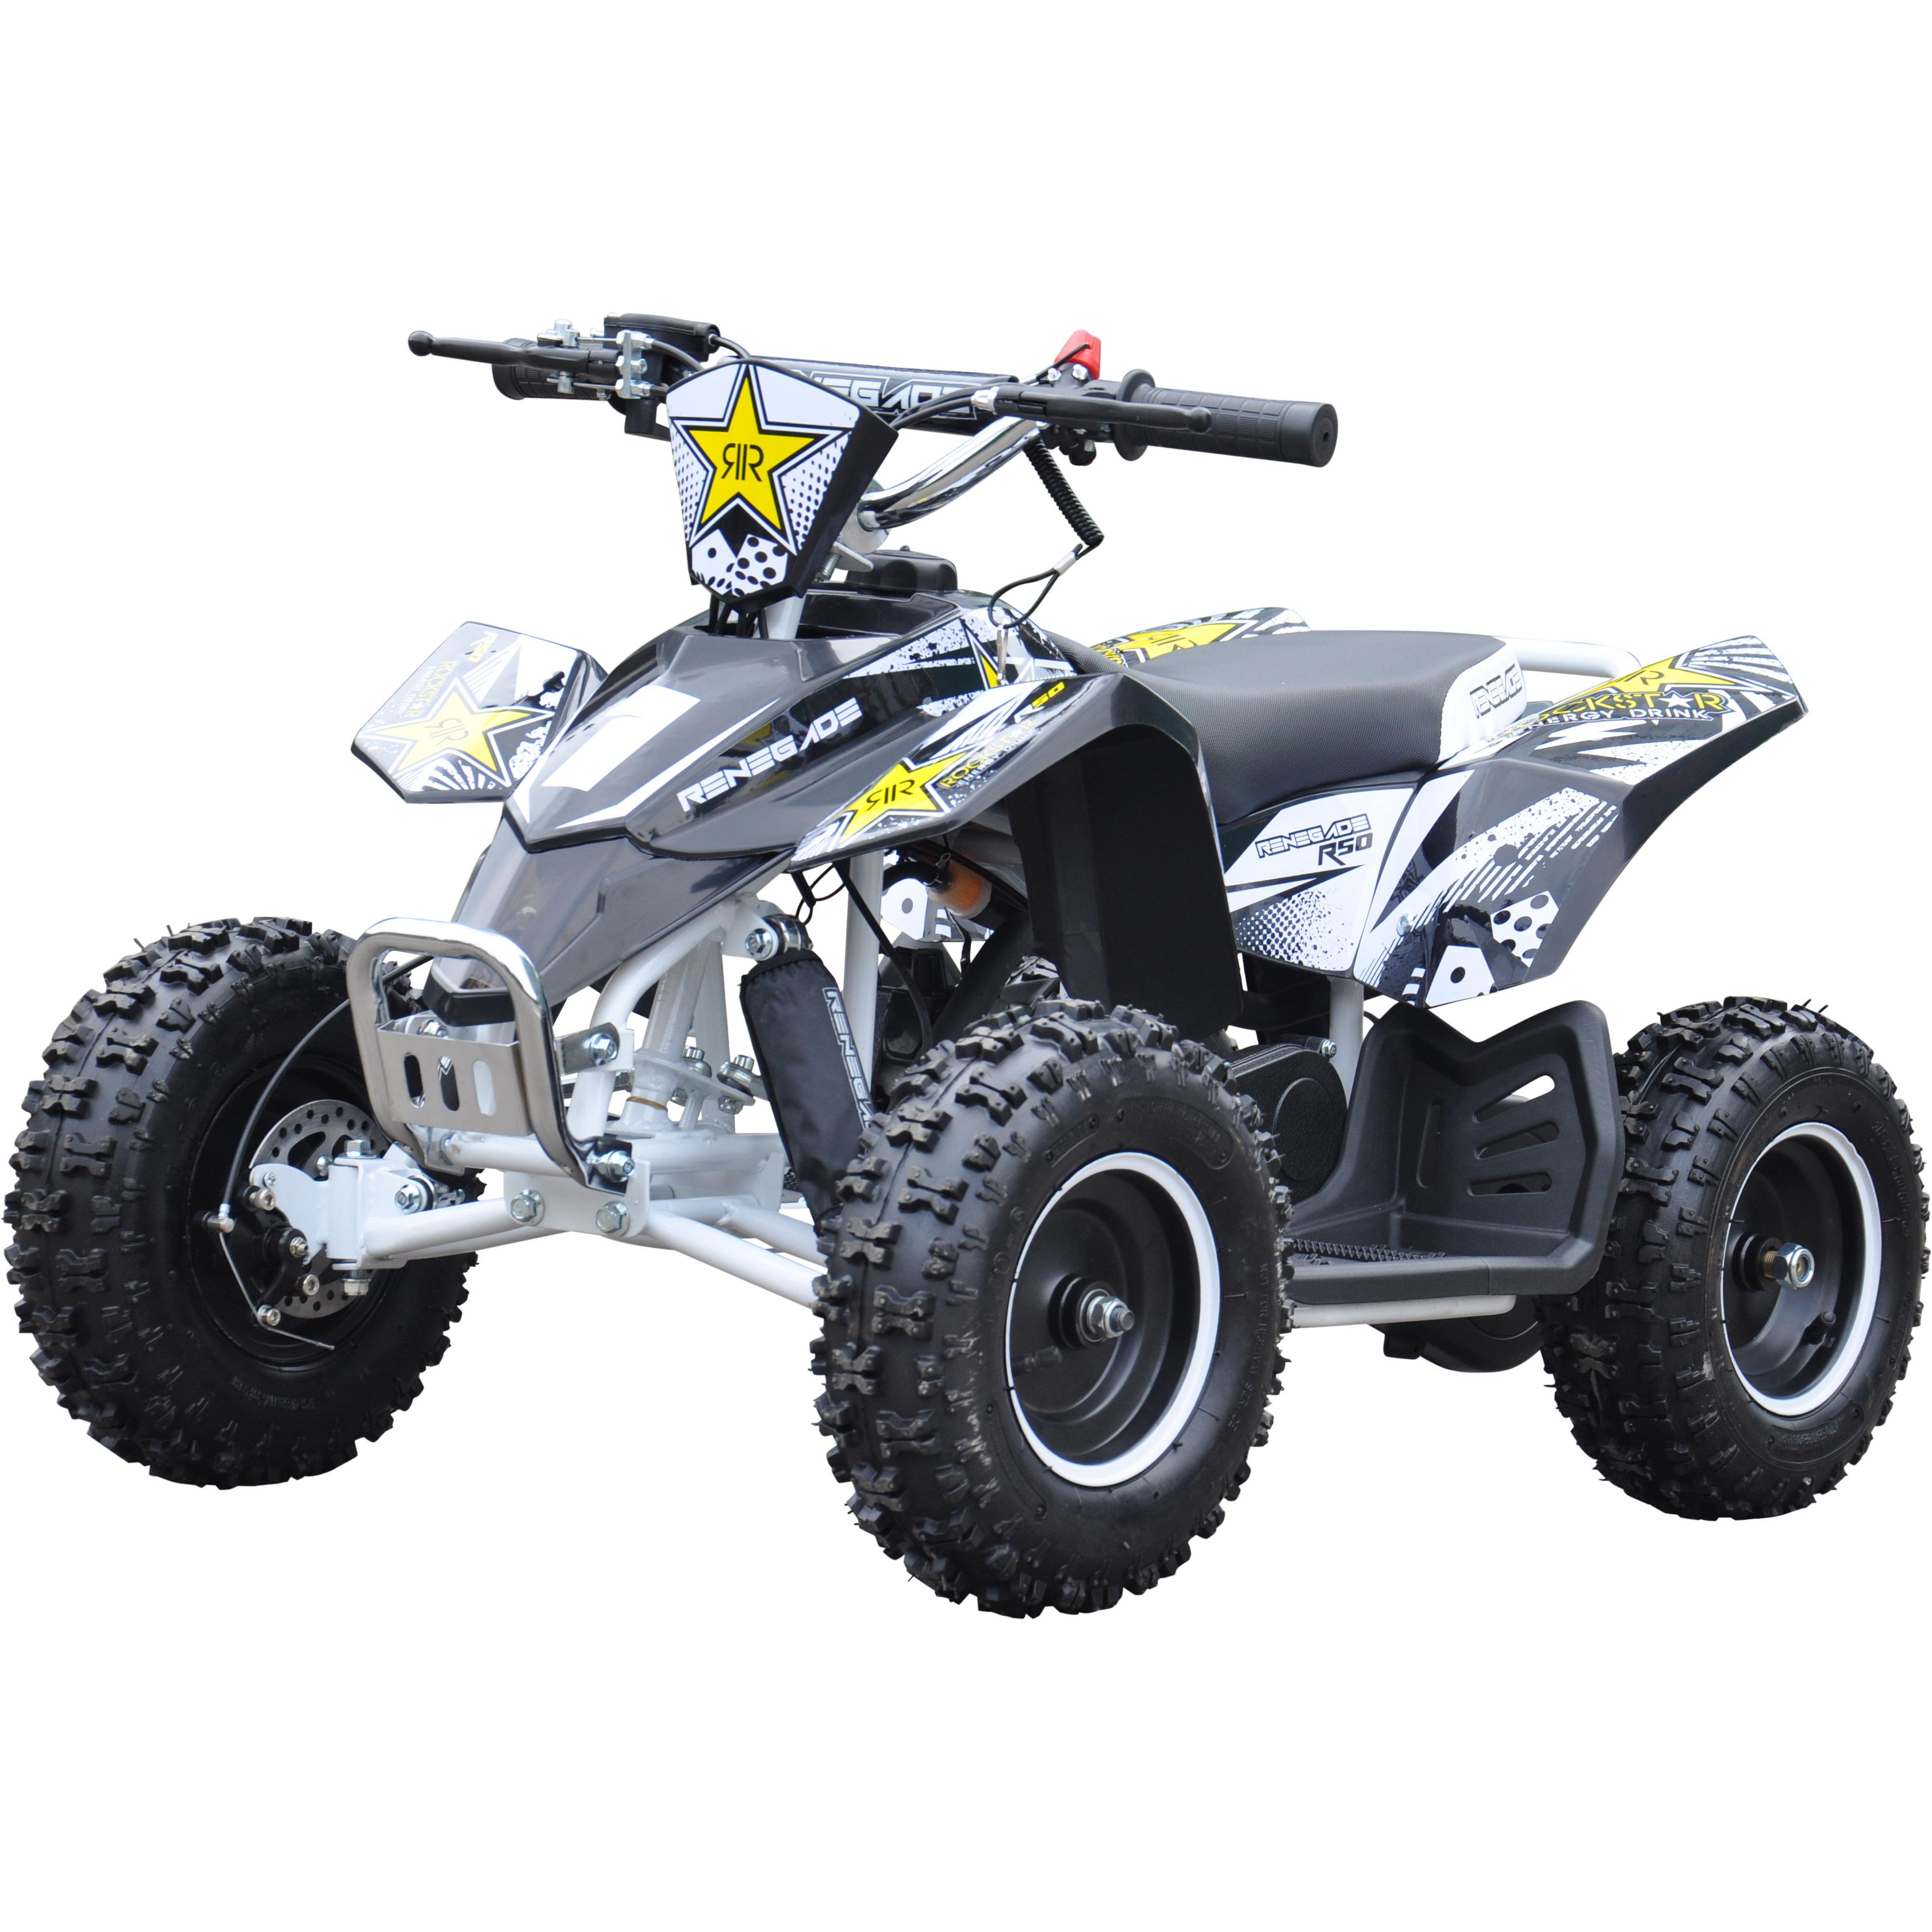 49cc terminator mini chopper wiring diagram rv converter pocket bike scooter